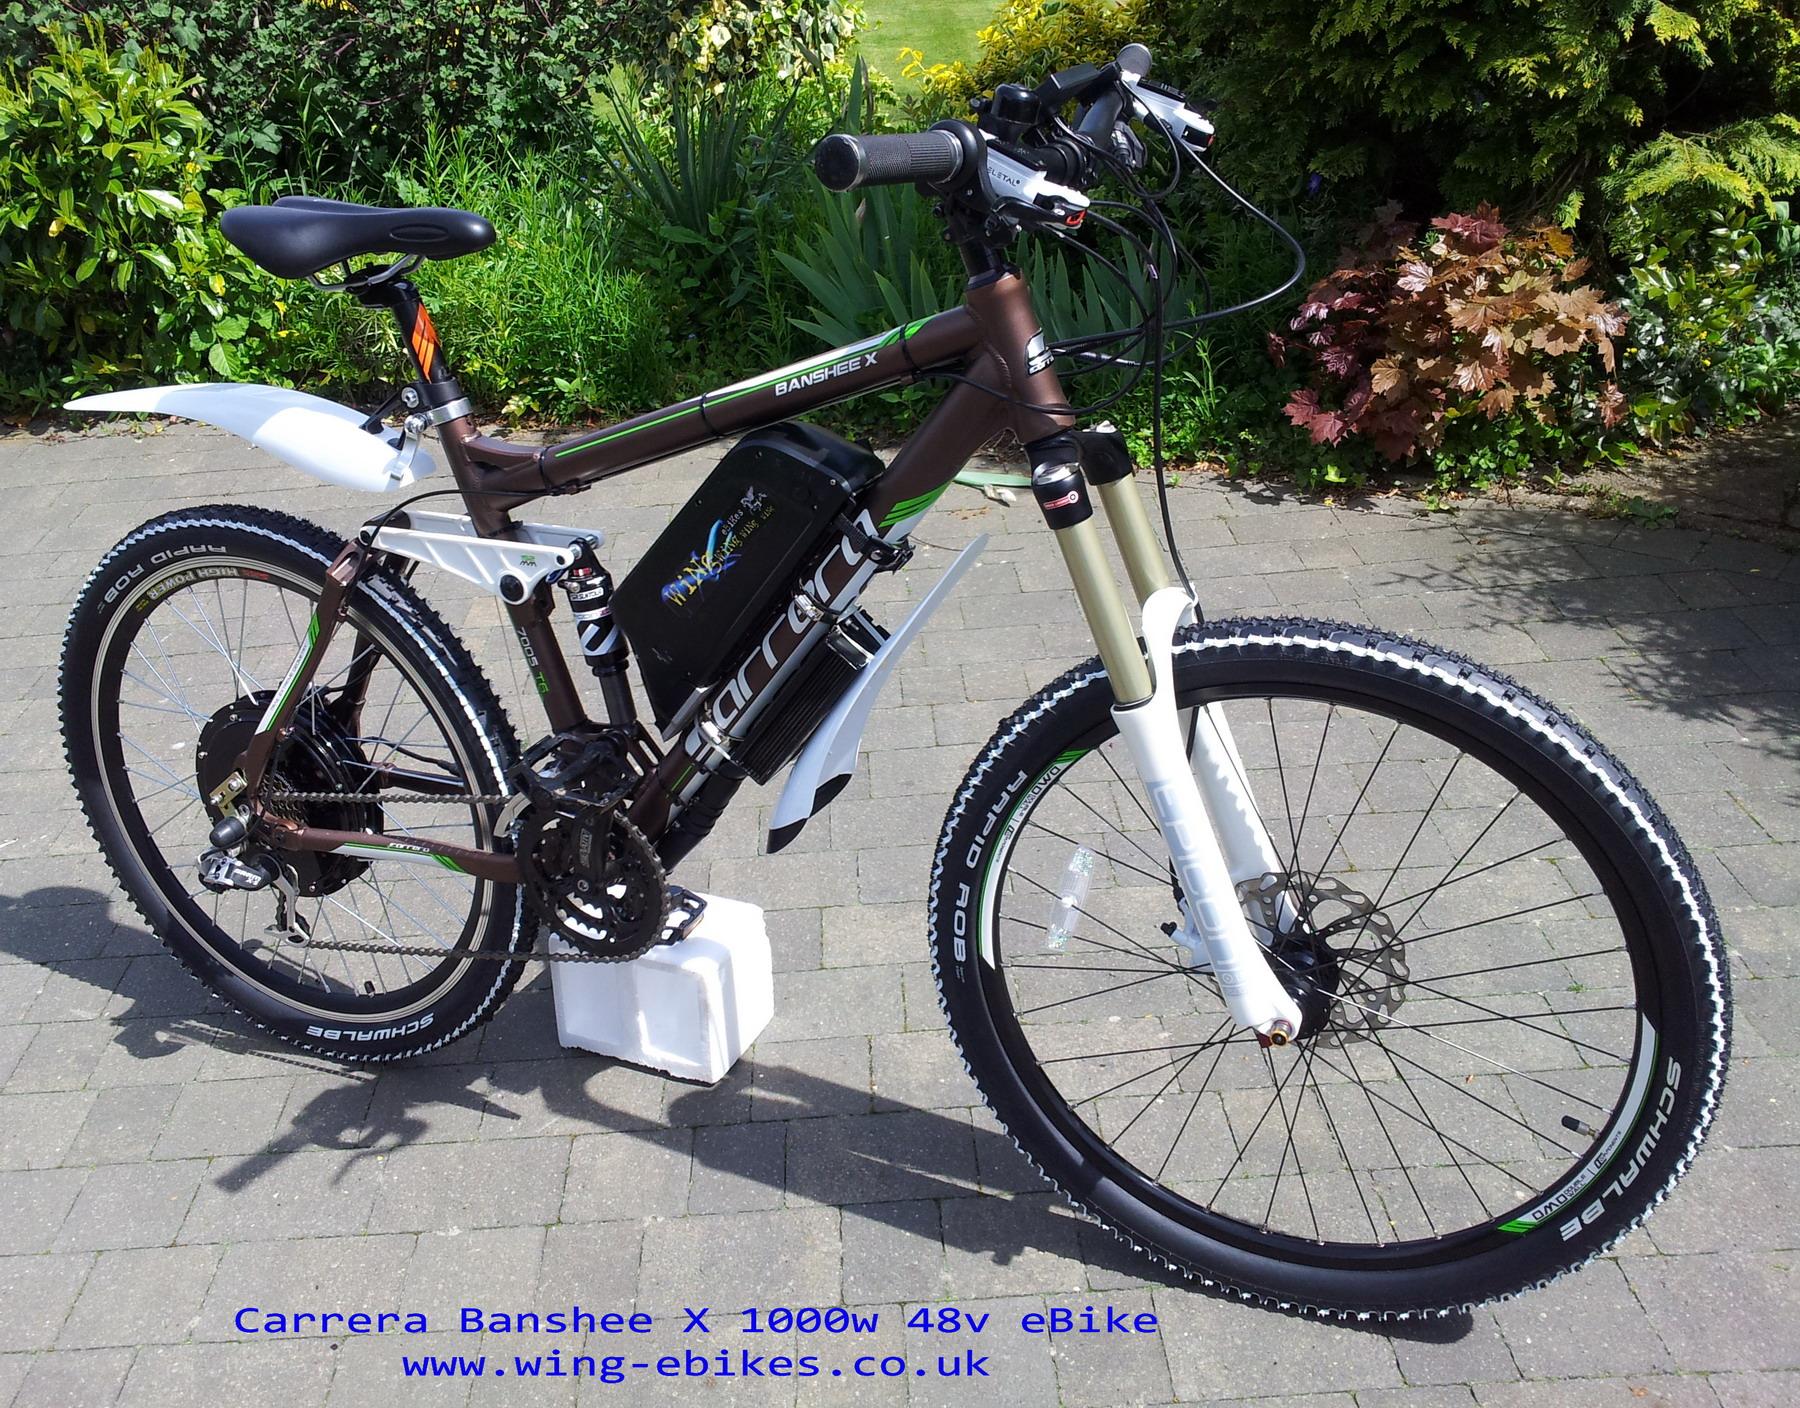 Carrera banshee x electric bike for Colorado motorized bicycle laws